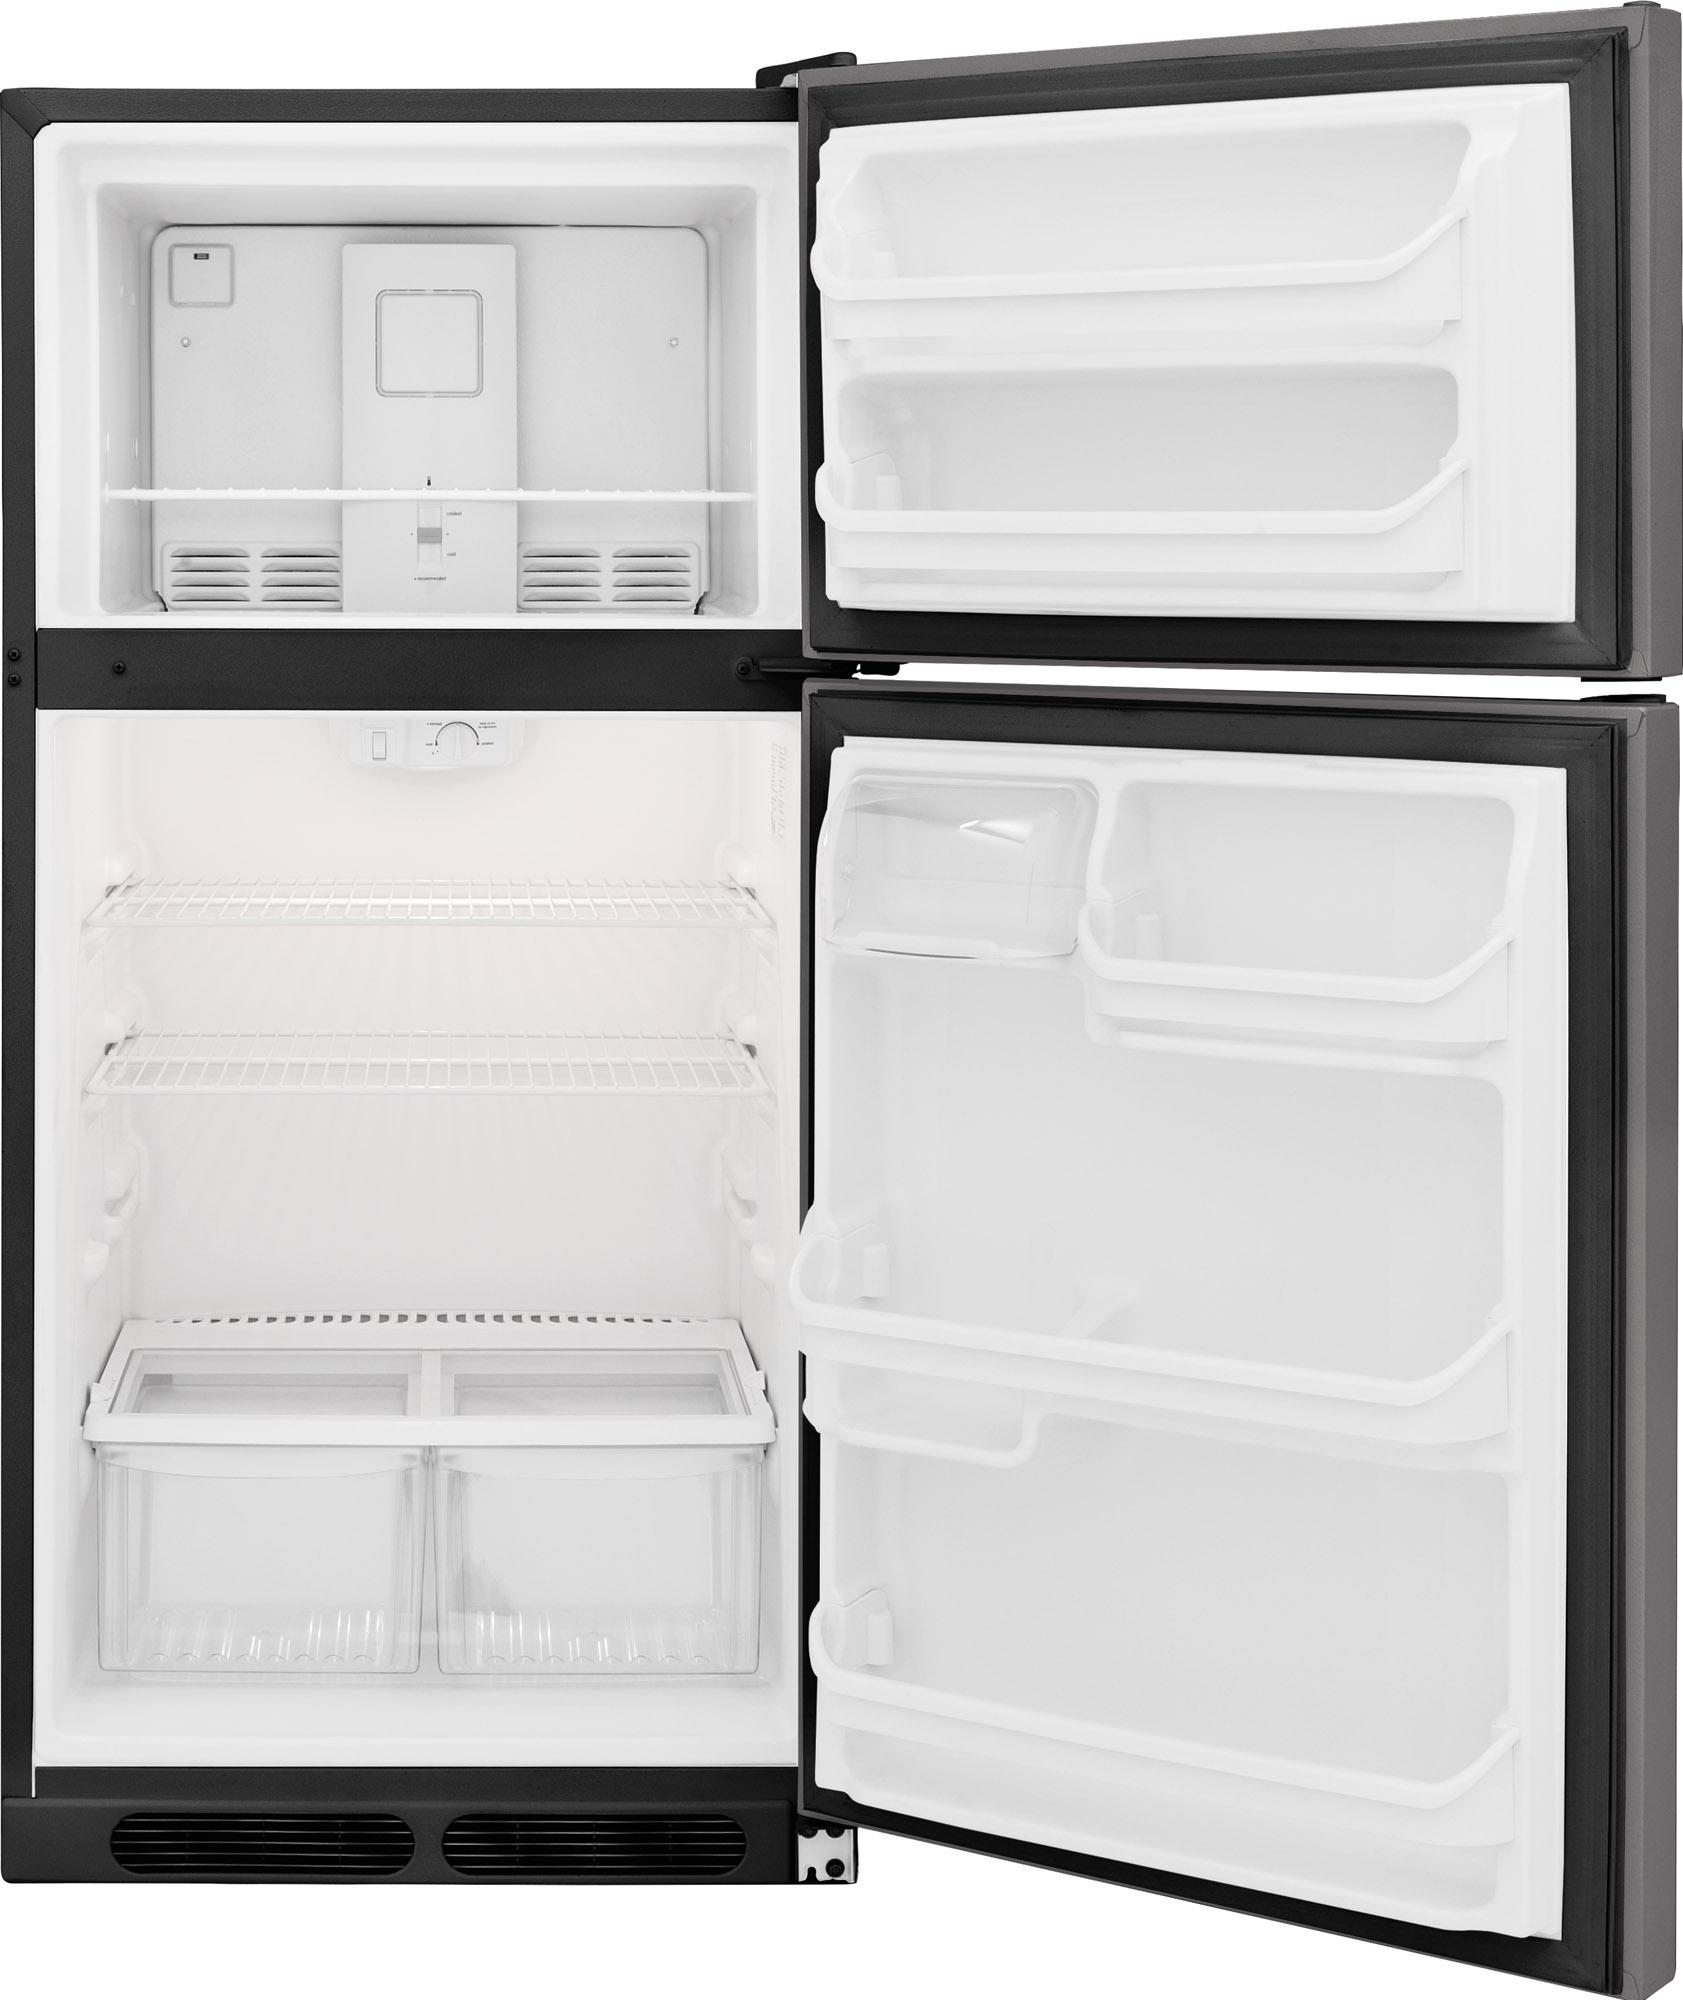 Frigidaire FFHT1514QS 14.5 cu. ft. Top-Mount Refrigerator - Stainless Steel